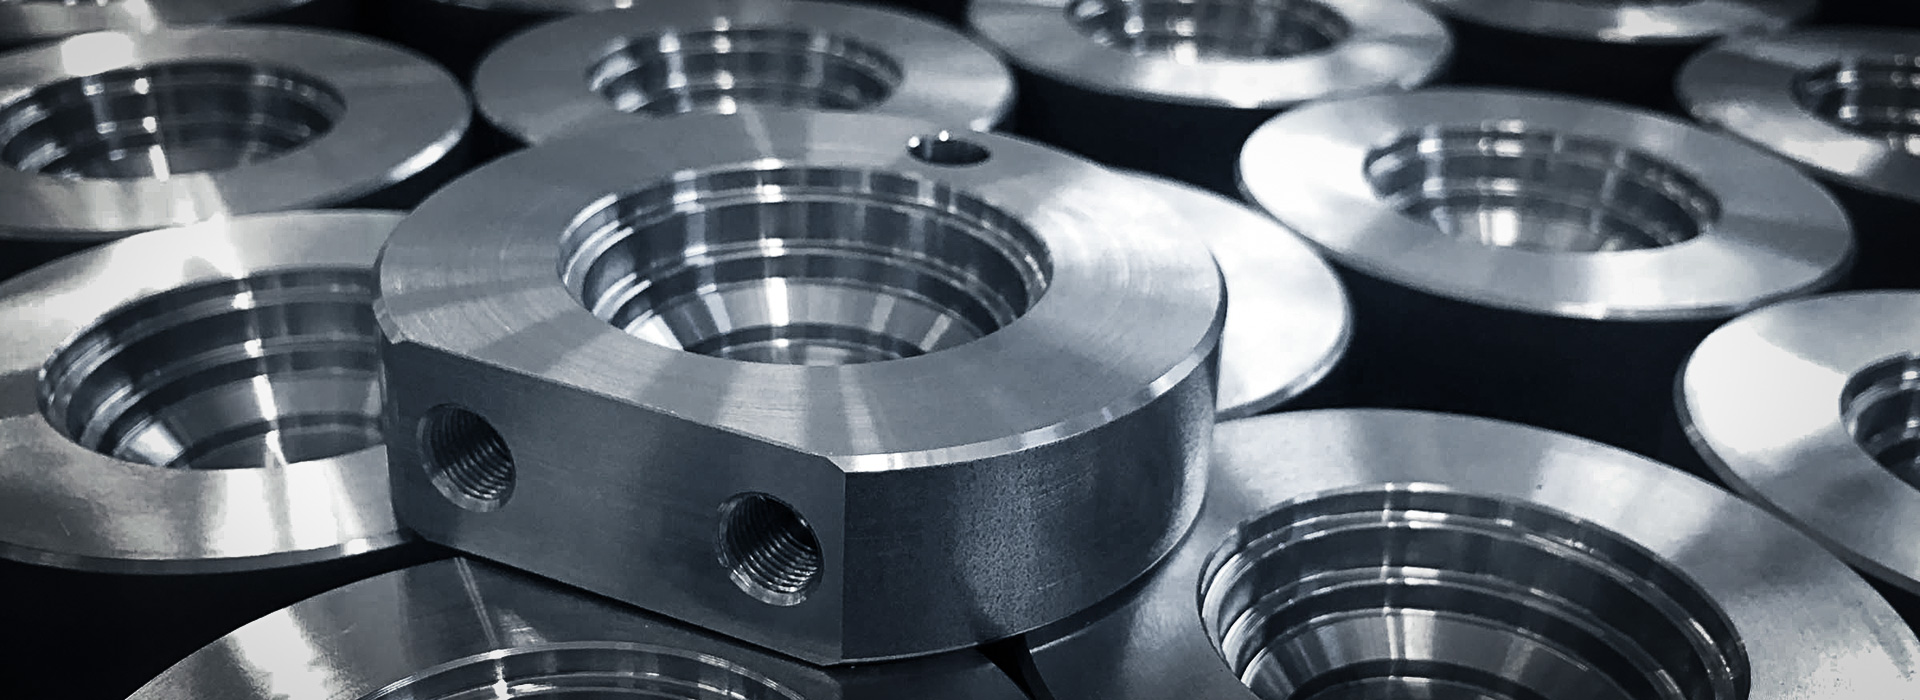 Meccanica di Precisione: tecnologia - Ferri Tech Srl